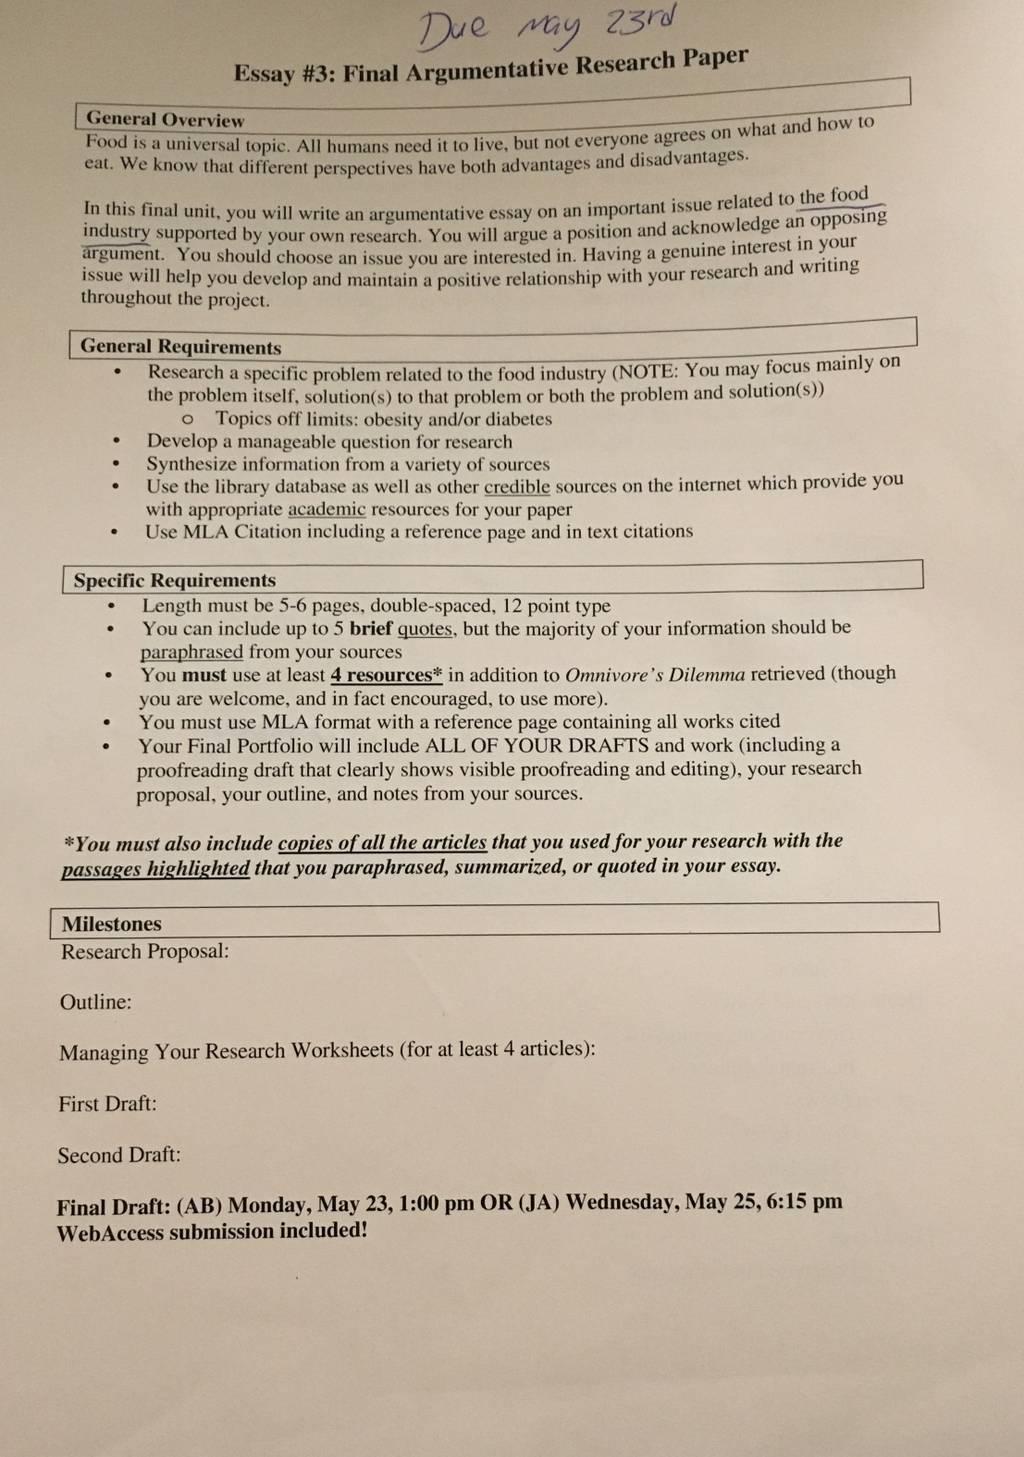 Final Argumentative Essay Research Paper Help